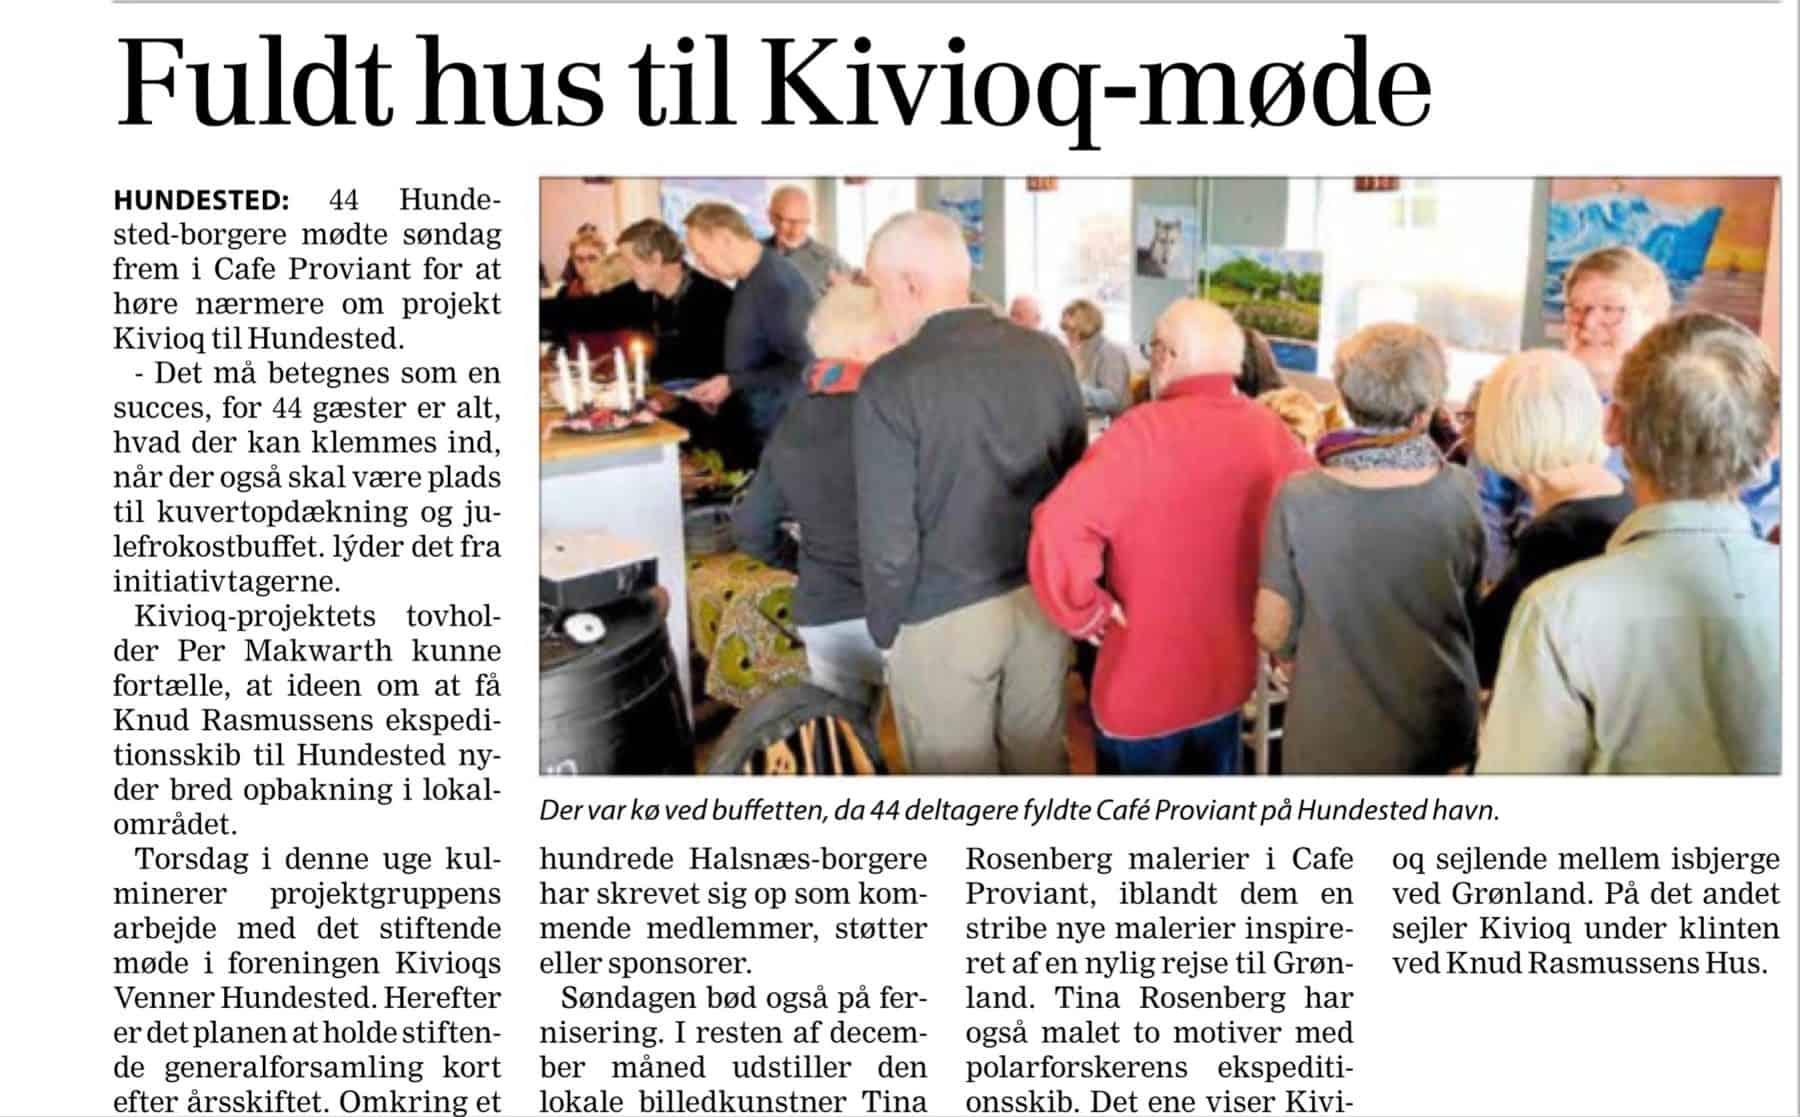 Frederiksborg Amts Avis 6. december 2017: Fuldt hus til Kivioq-møde